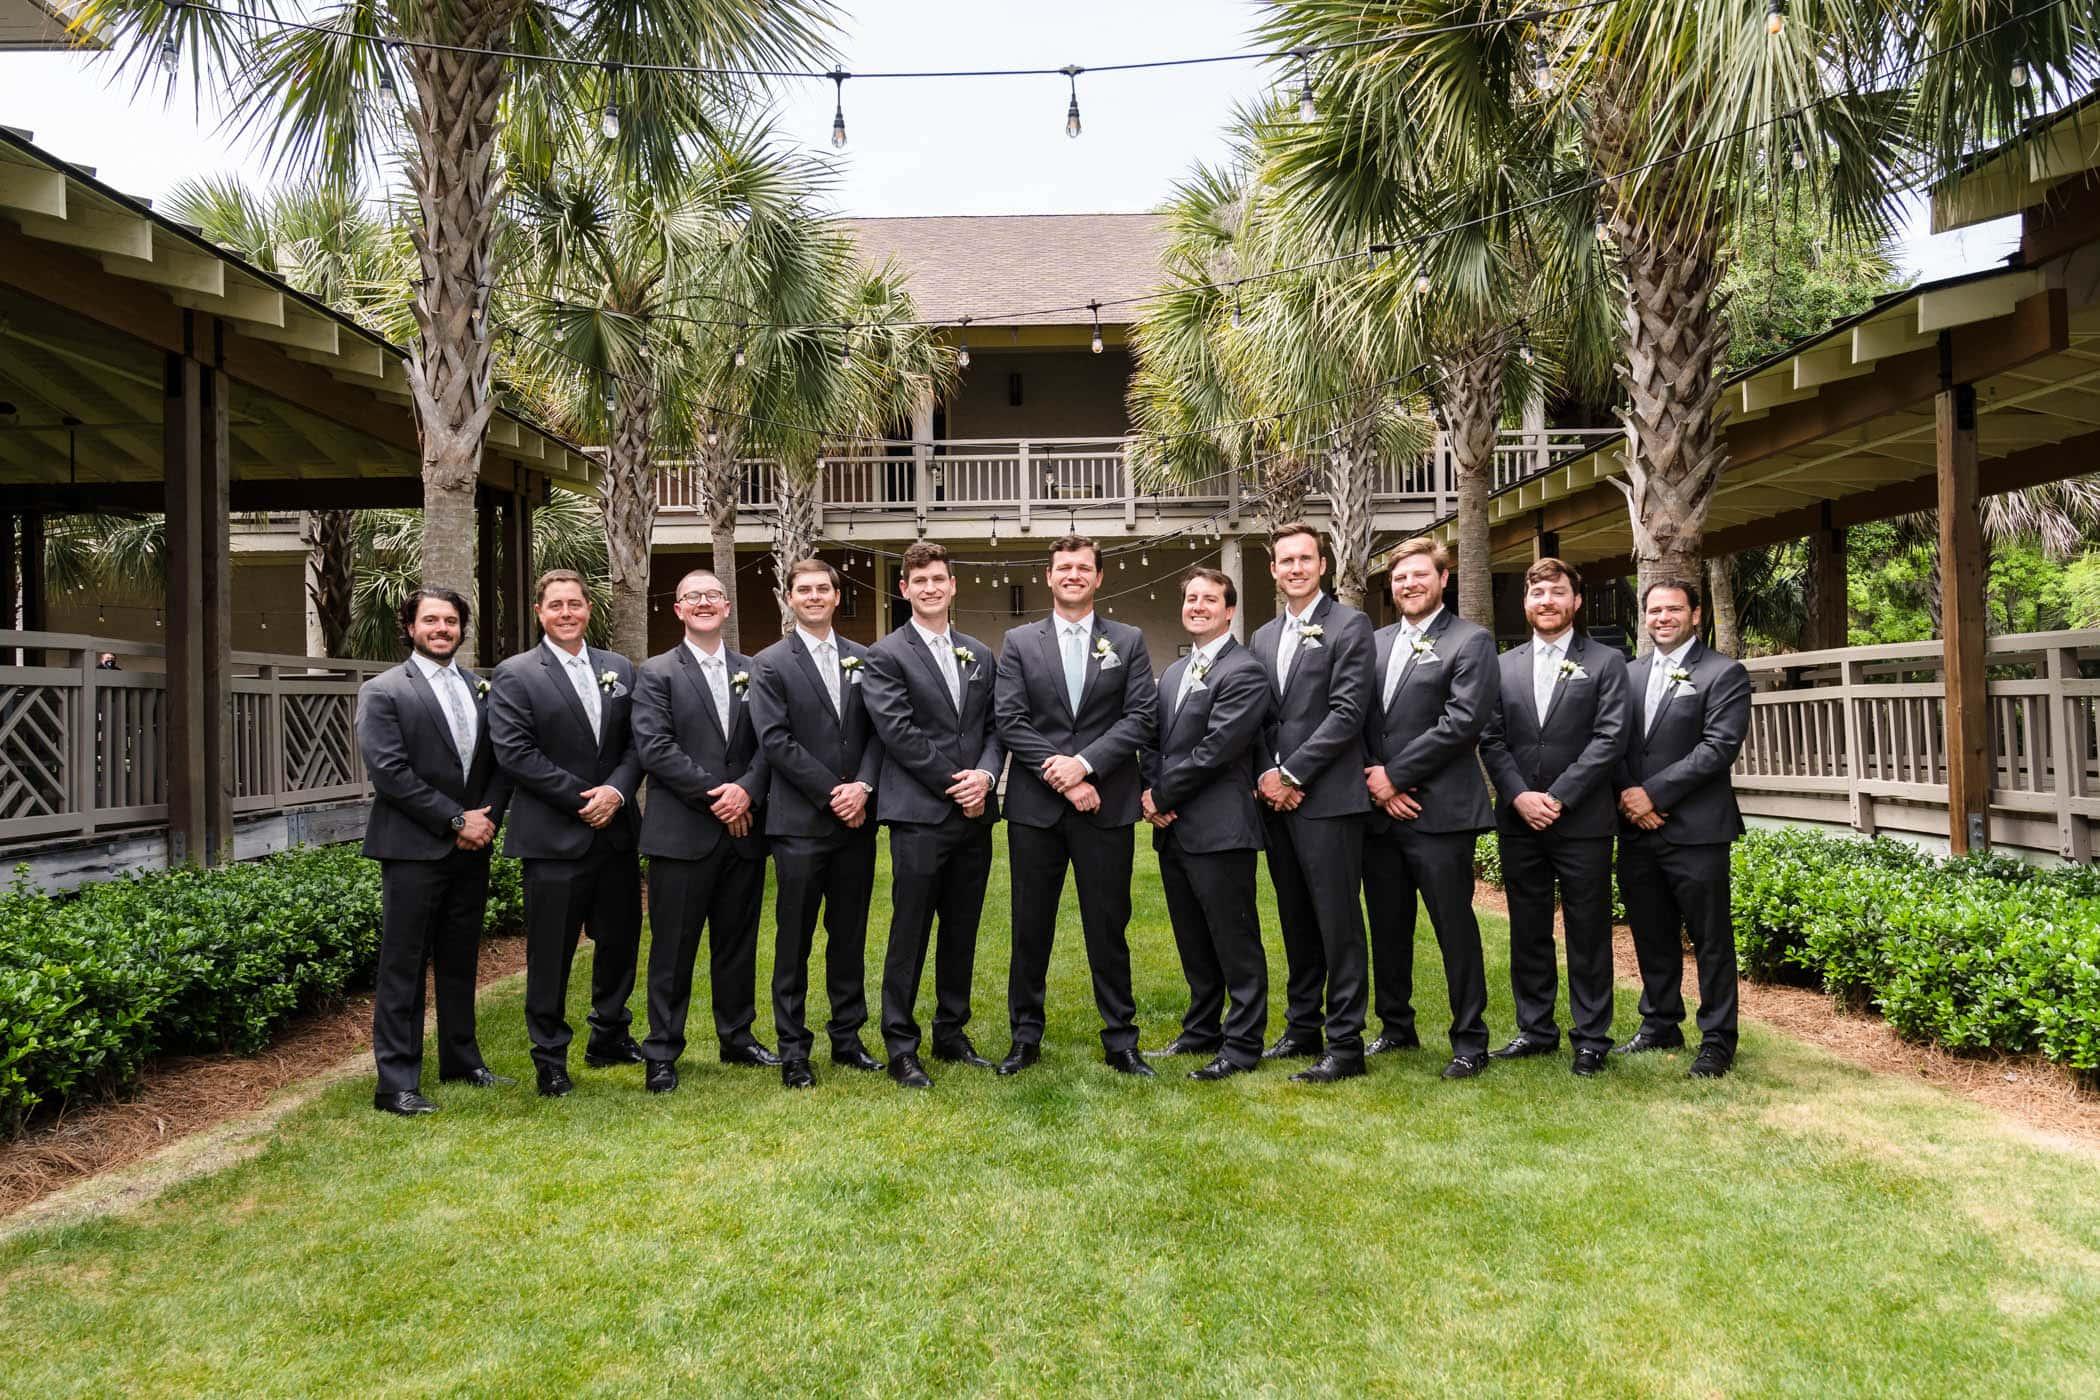 Groom and Groomsmen Omni Hilton Head Ocean Resort Beach Wedding